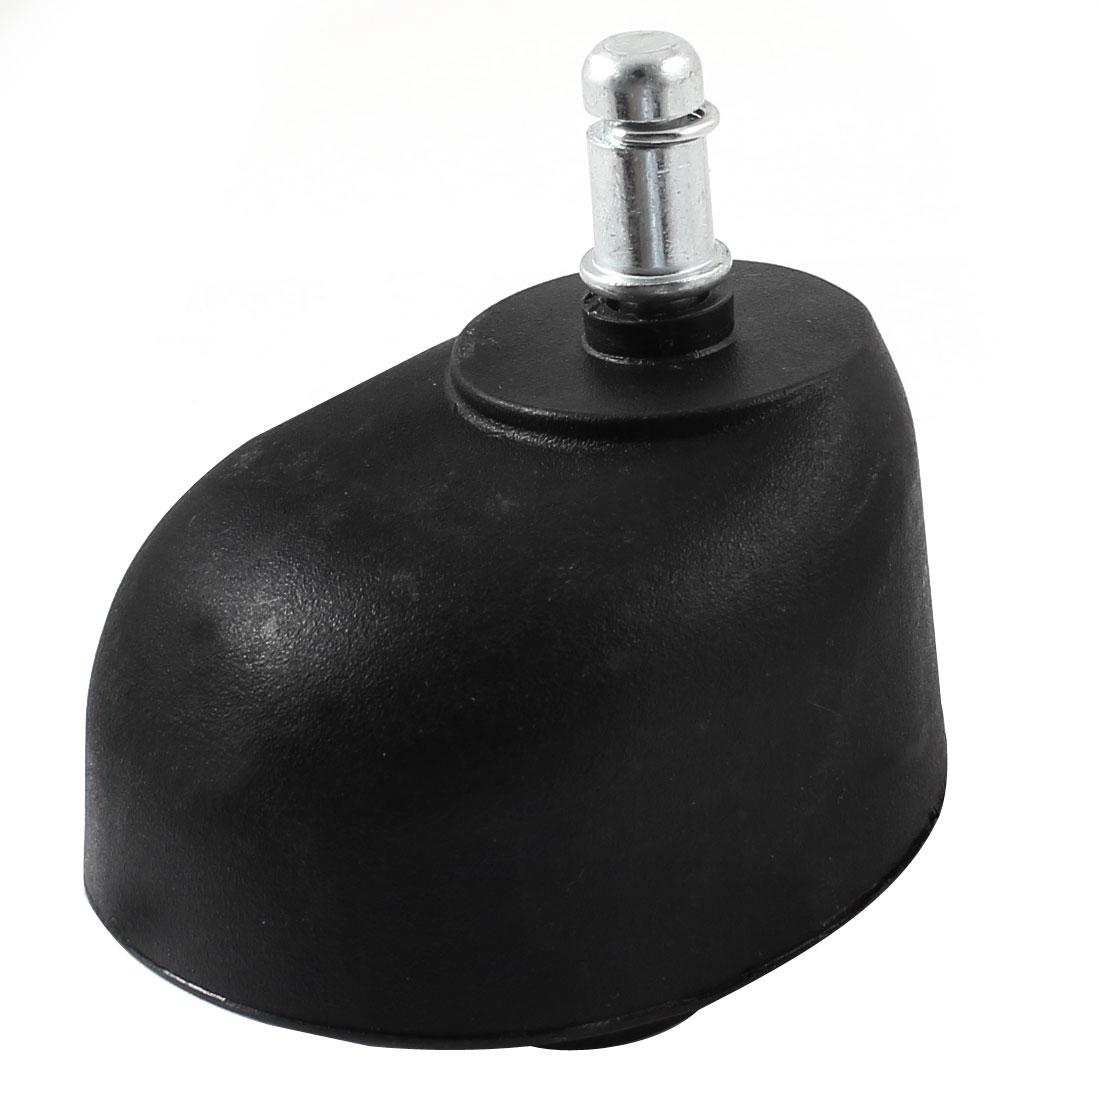 Office Chair Shopping Cart 11mm Lock Shaft Dia Plastic Housing Double Roller Grip Ring Stem Caster Wheel